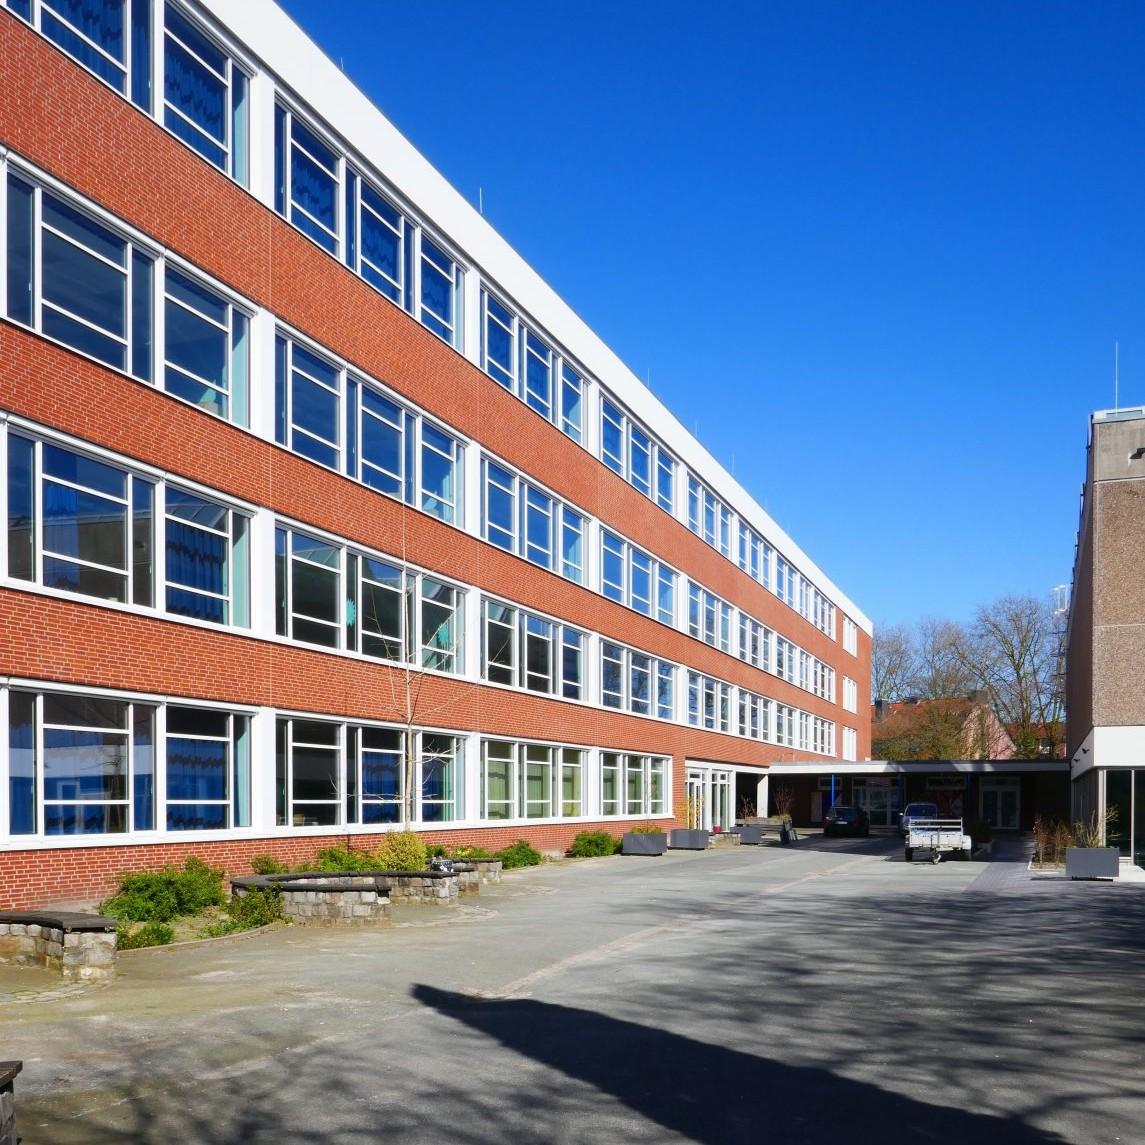 20 Ratsgymnasium, Bohlweg - Foto: Stefan Rethfeld